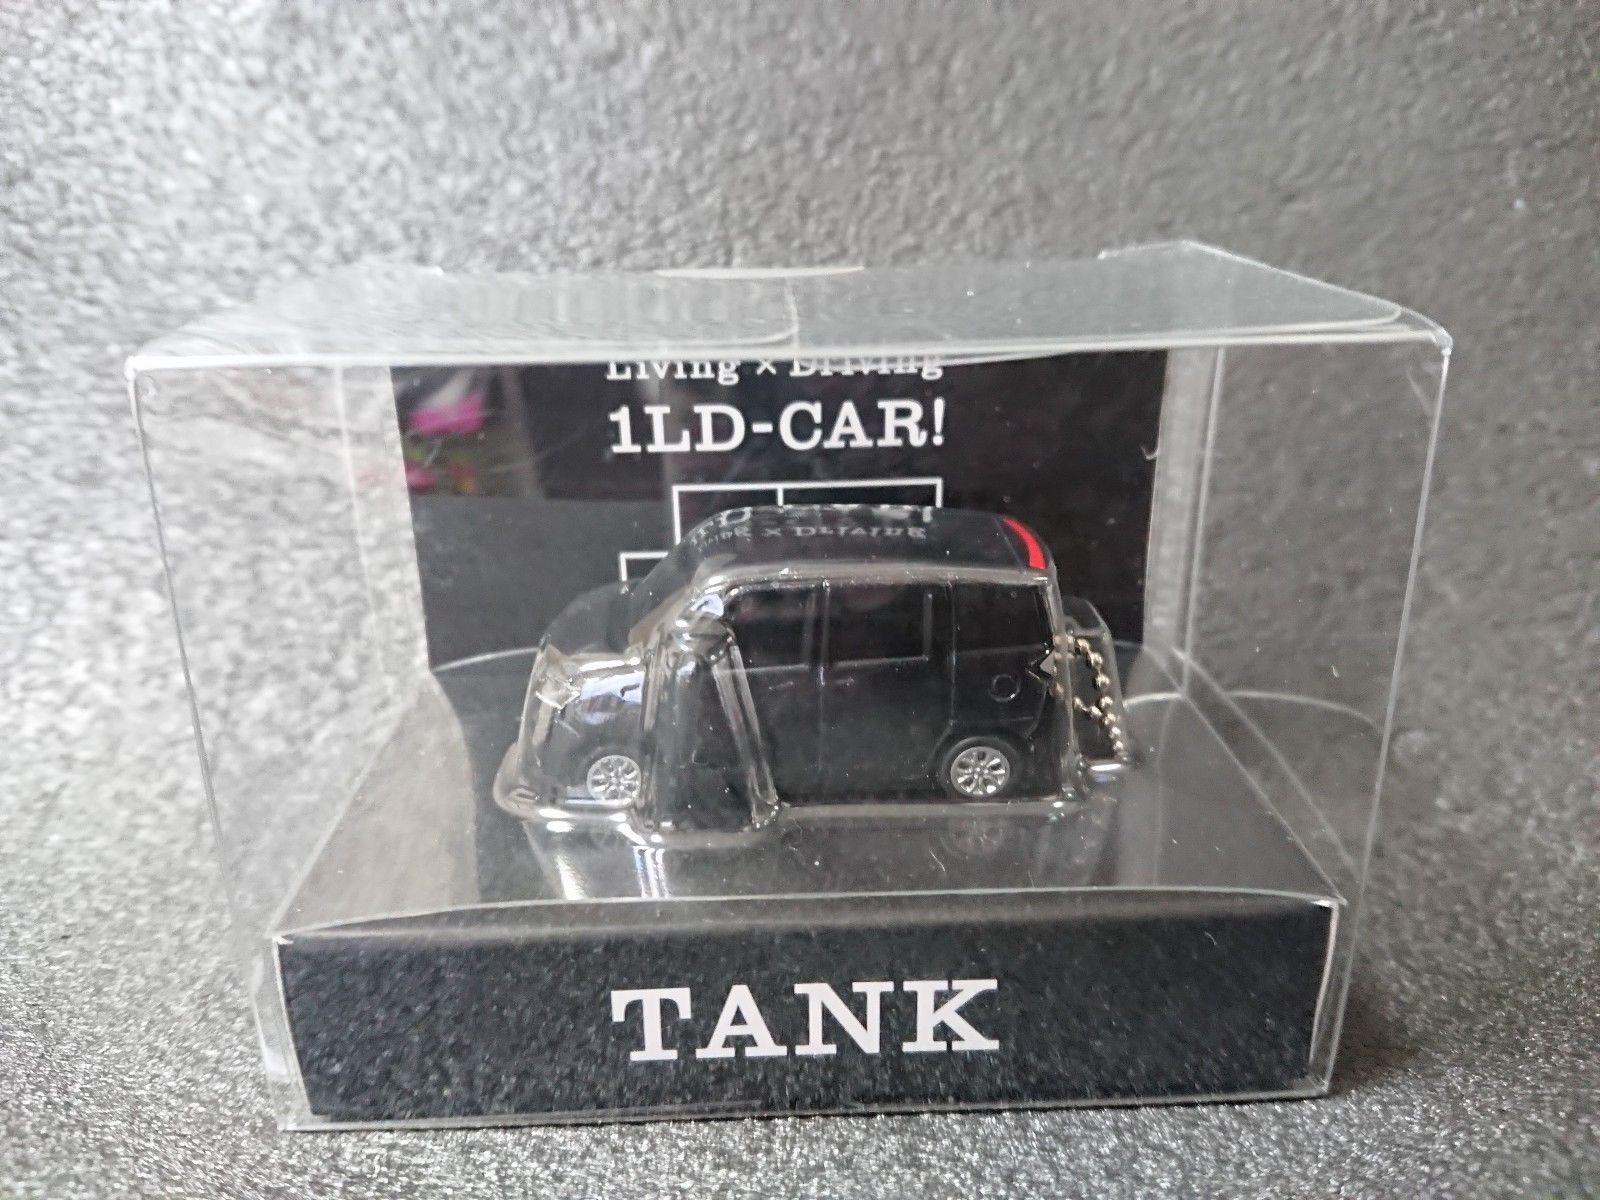 TOYOTA CHR Black LED Light Keychain Pull Back Mini Car C-HR Not Sold in stores